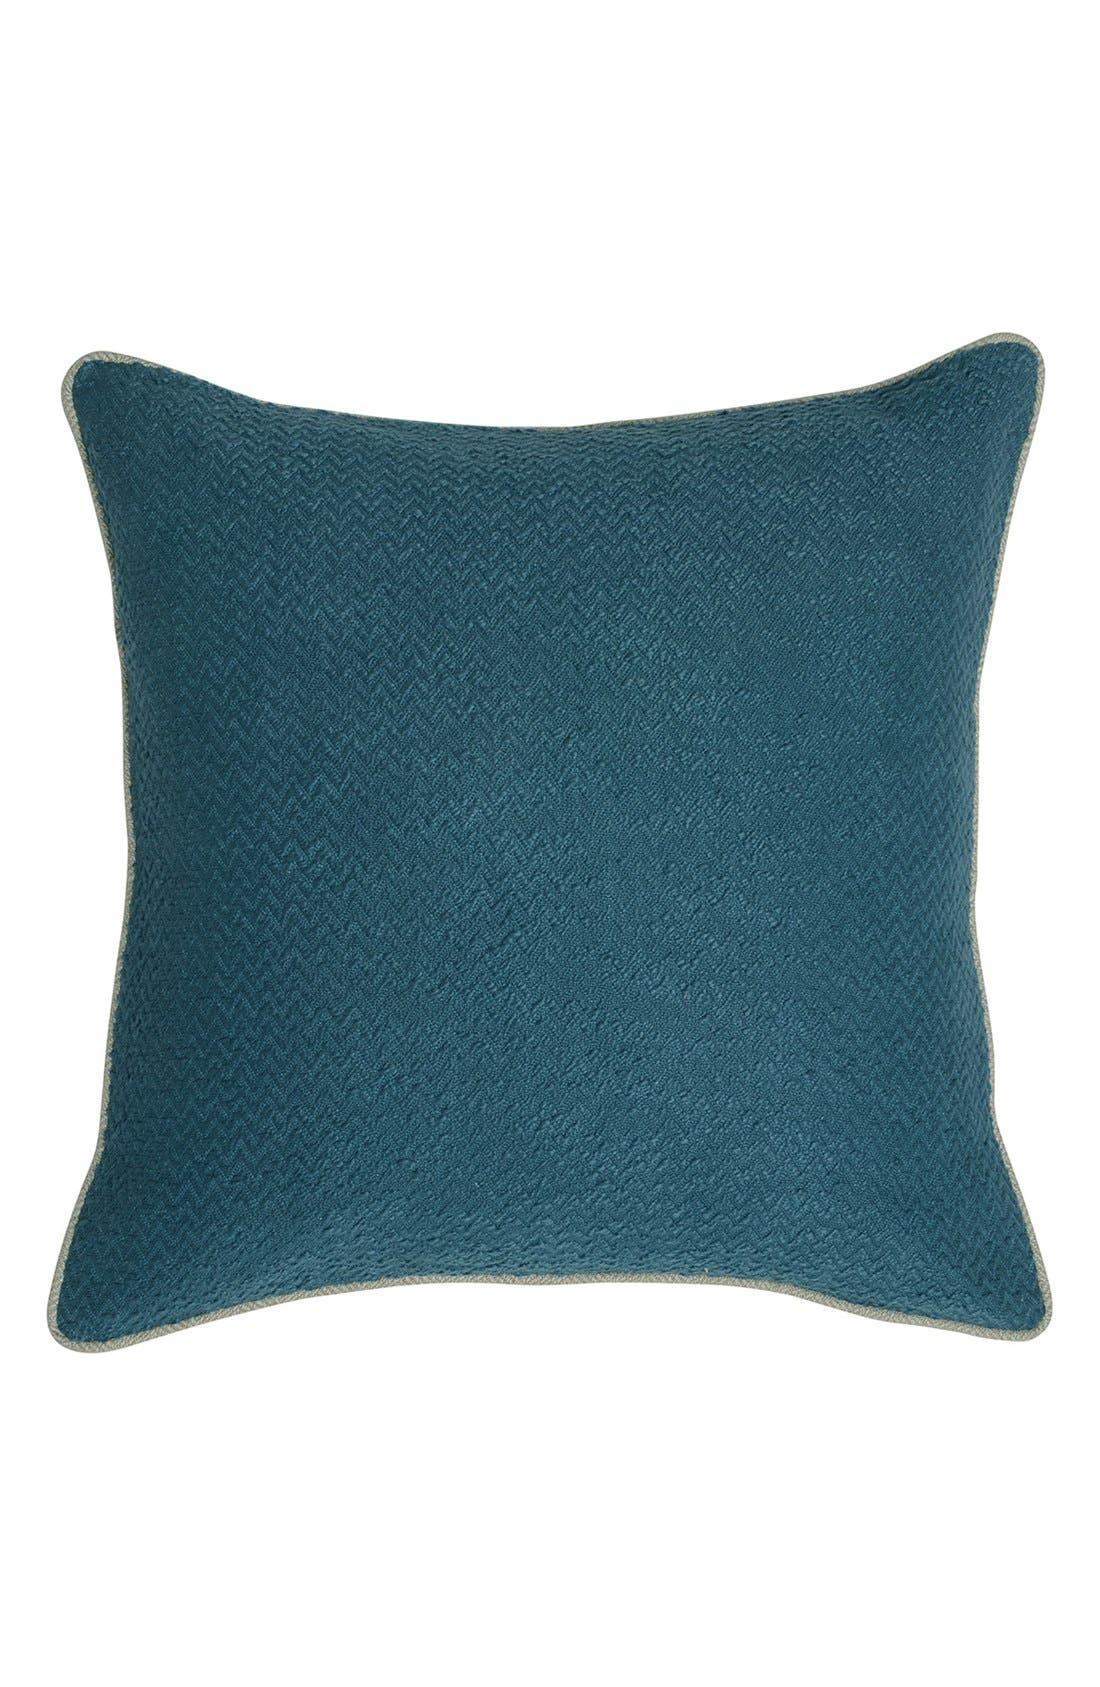 'Razia' Pillow,                             Main thumbnail 1, color,                             Marine Blue